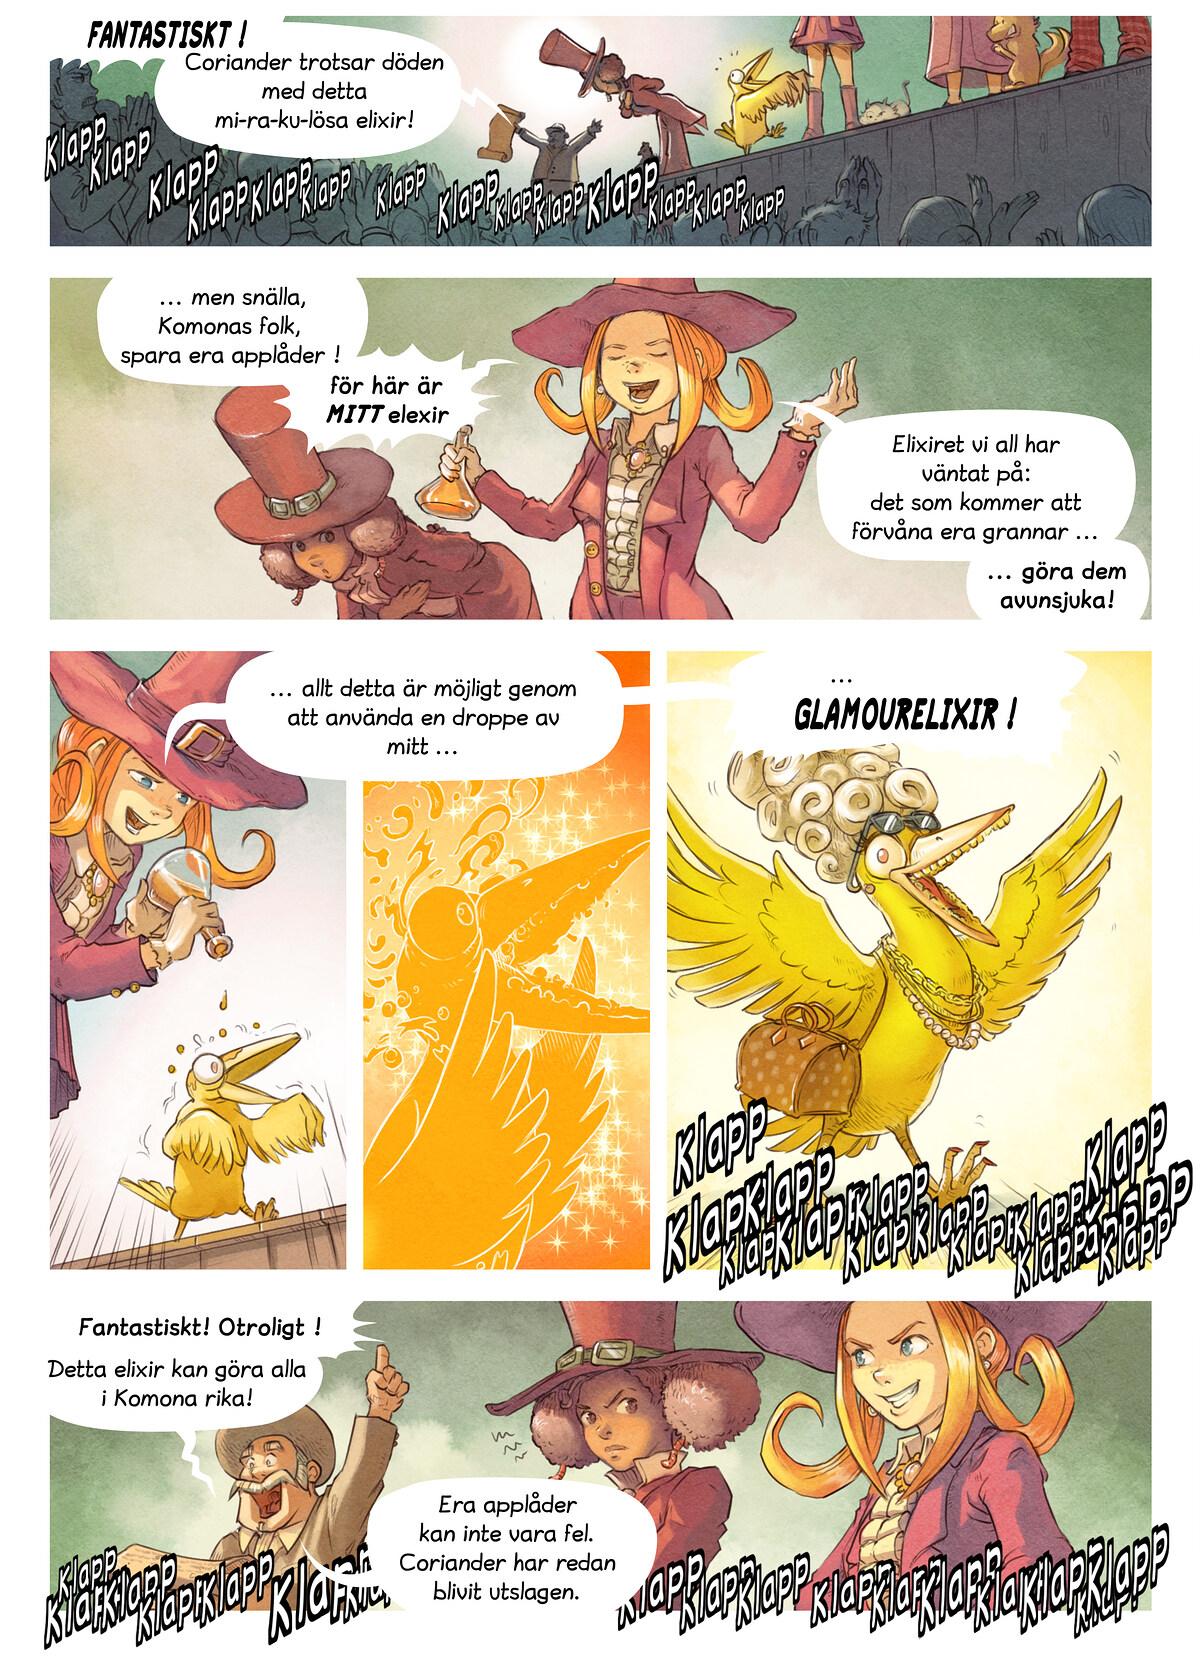 Episode 6: Elixrtävlingen, Page 5